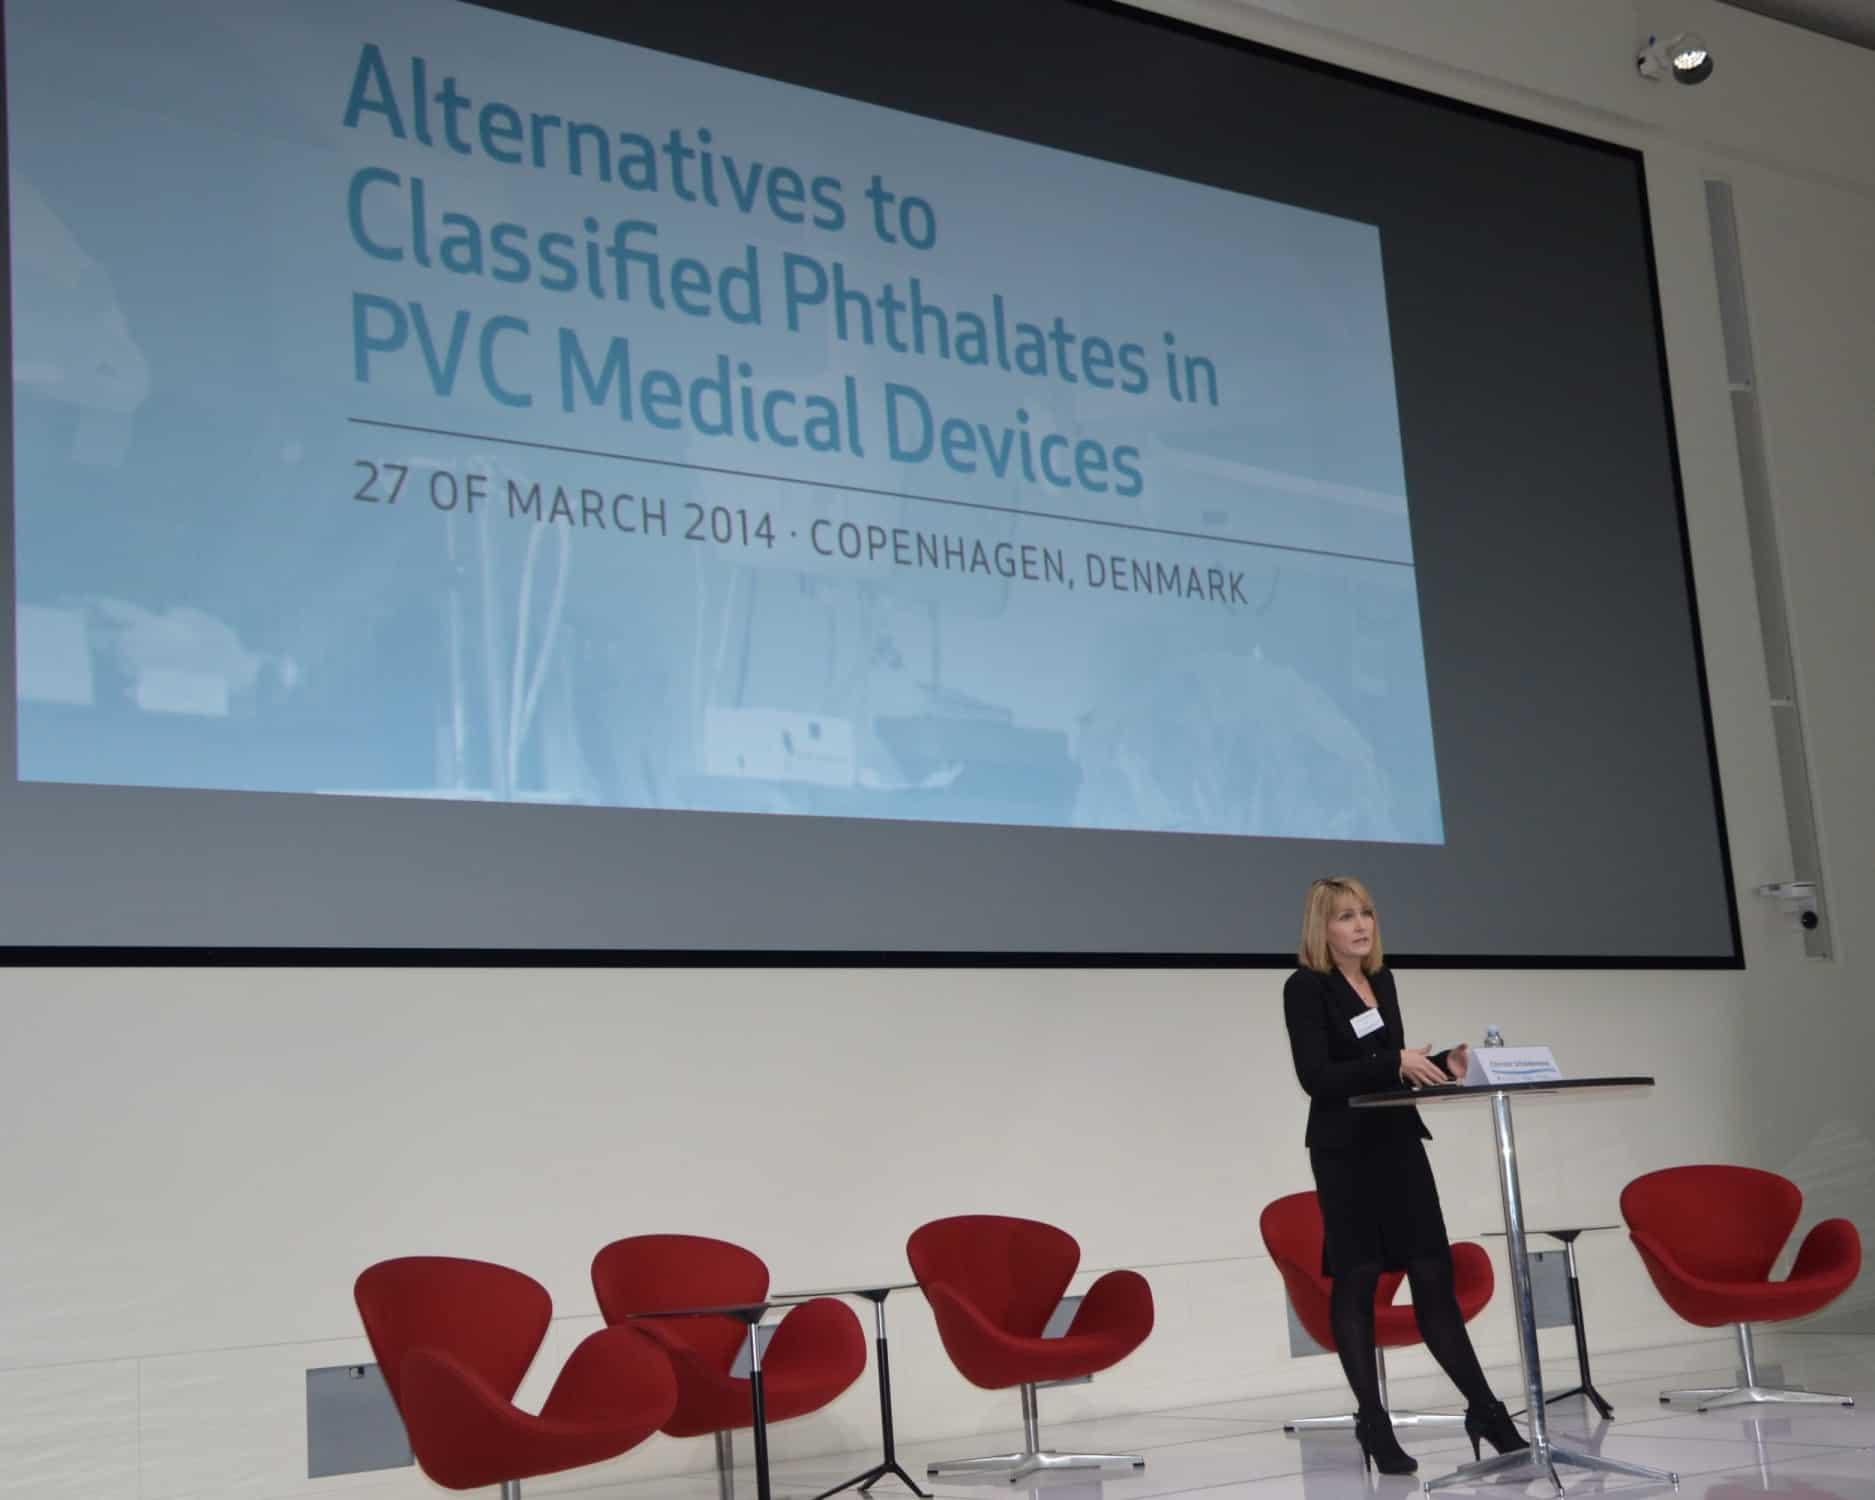 Alternatives to classified Phthalates presentation